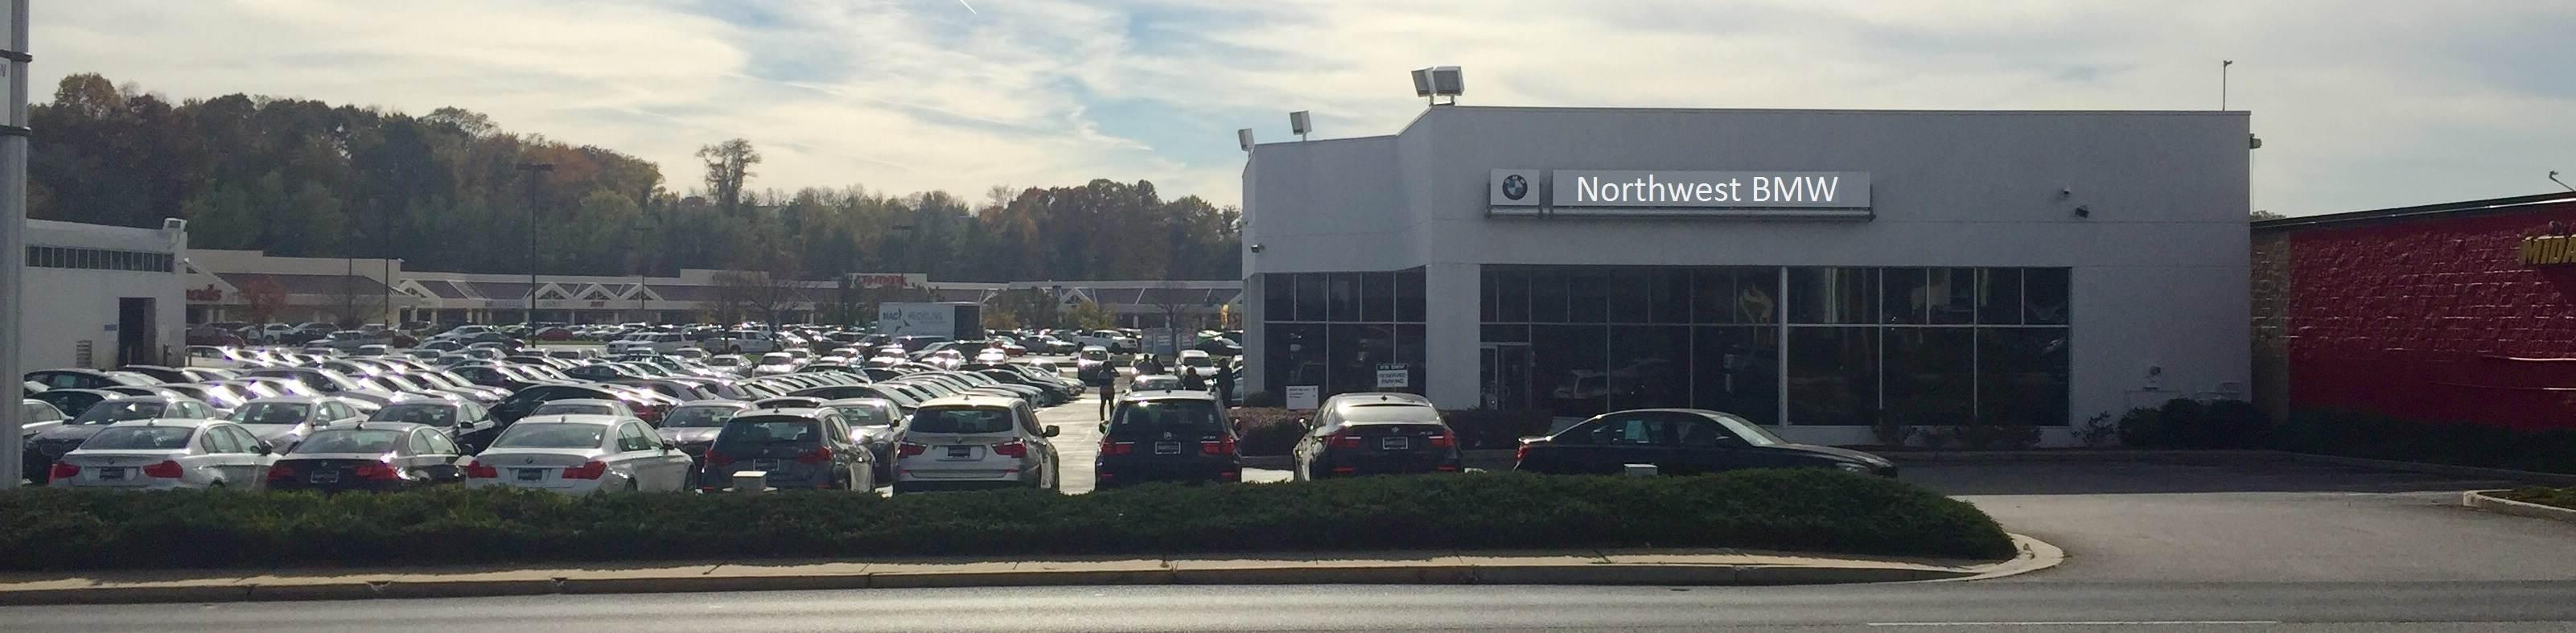 Northwest Bmw New Bmw Dealership In Owings Mills Md 21117